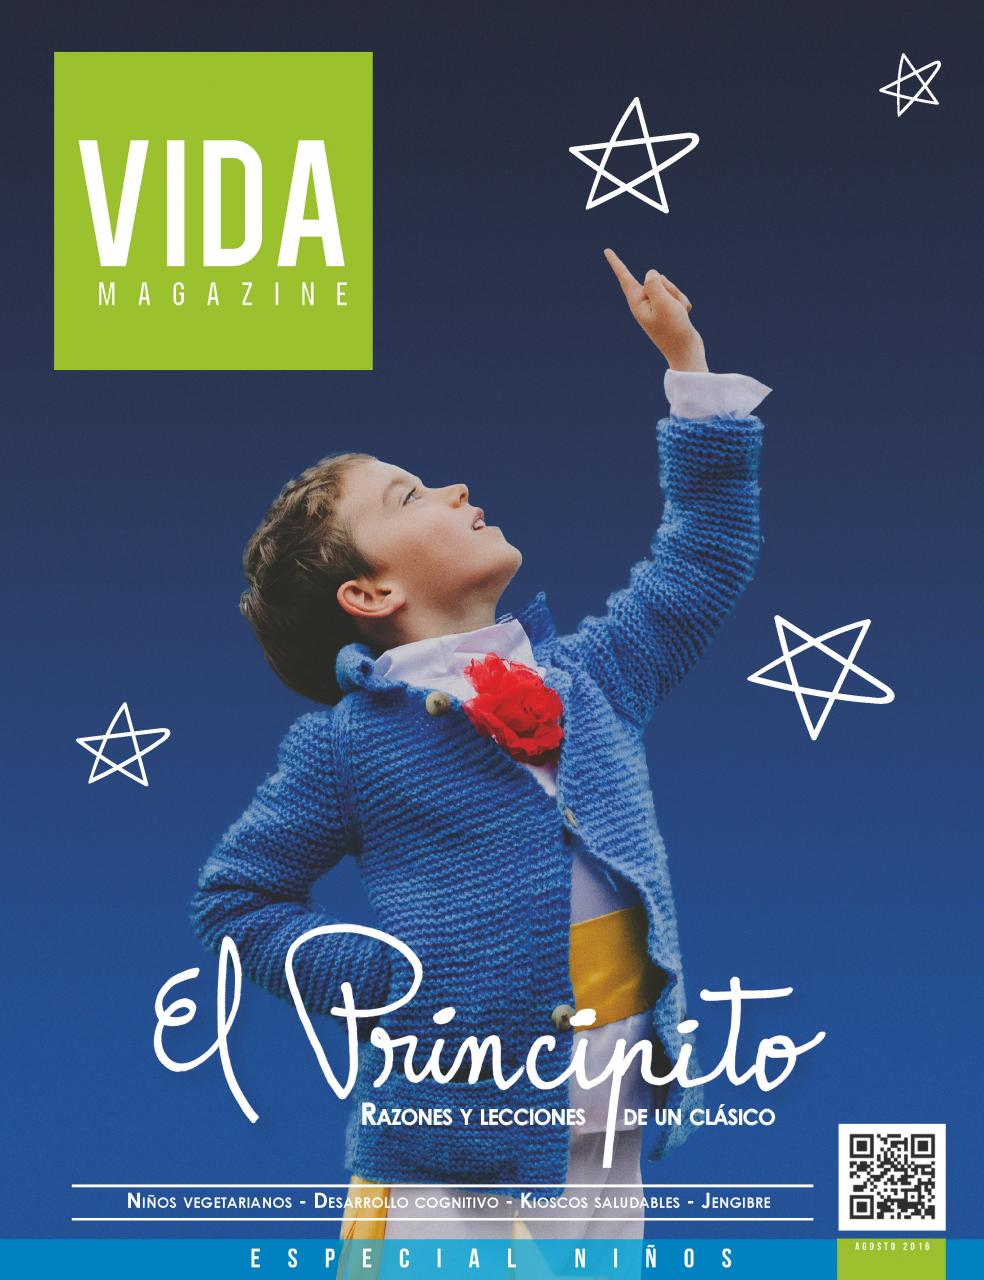 vida-magazine-edicion-n23